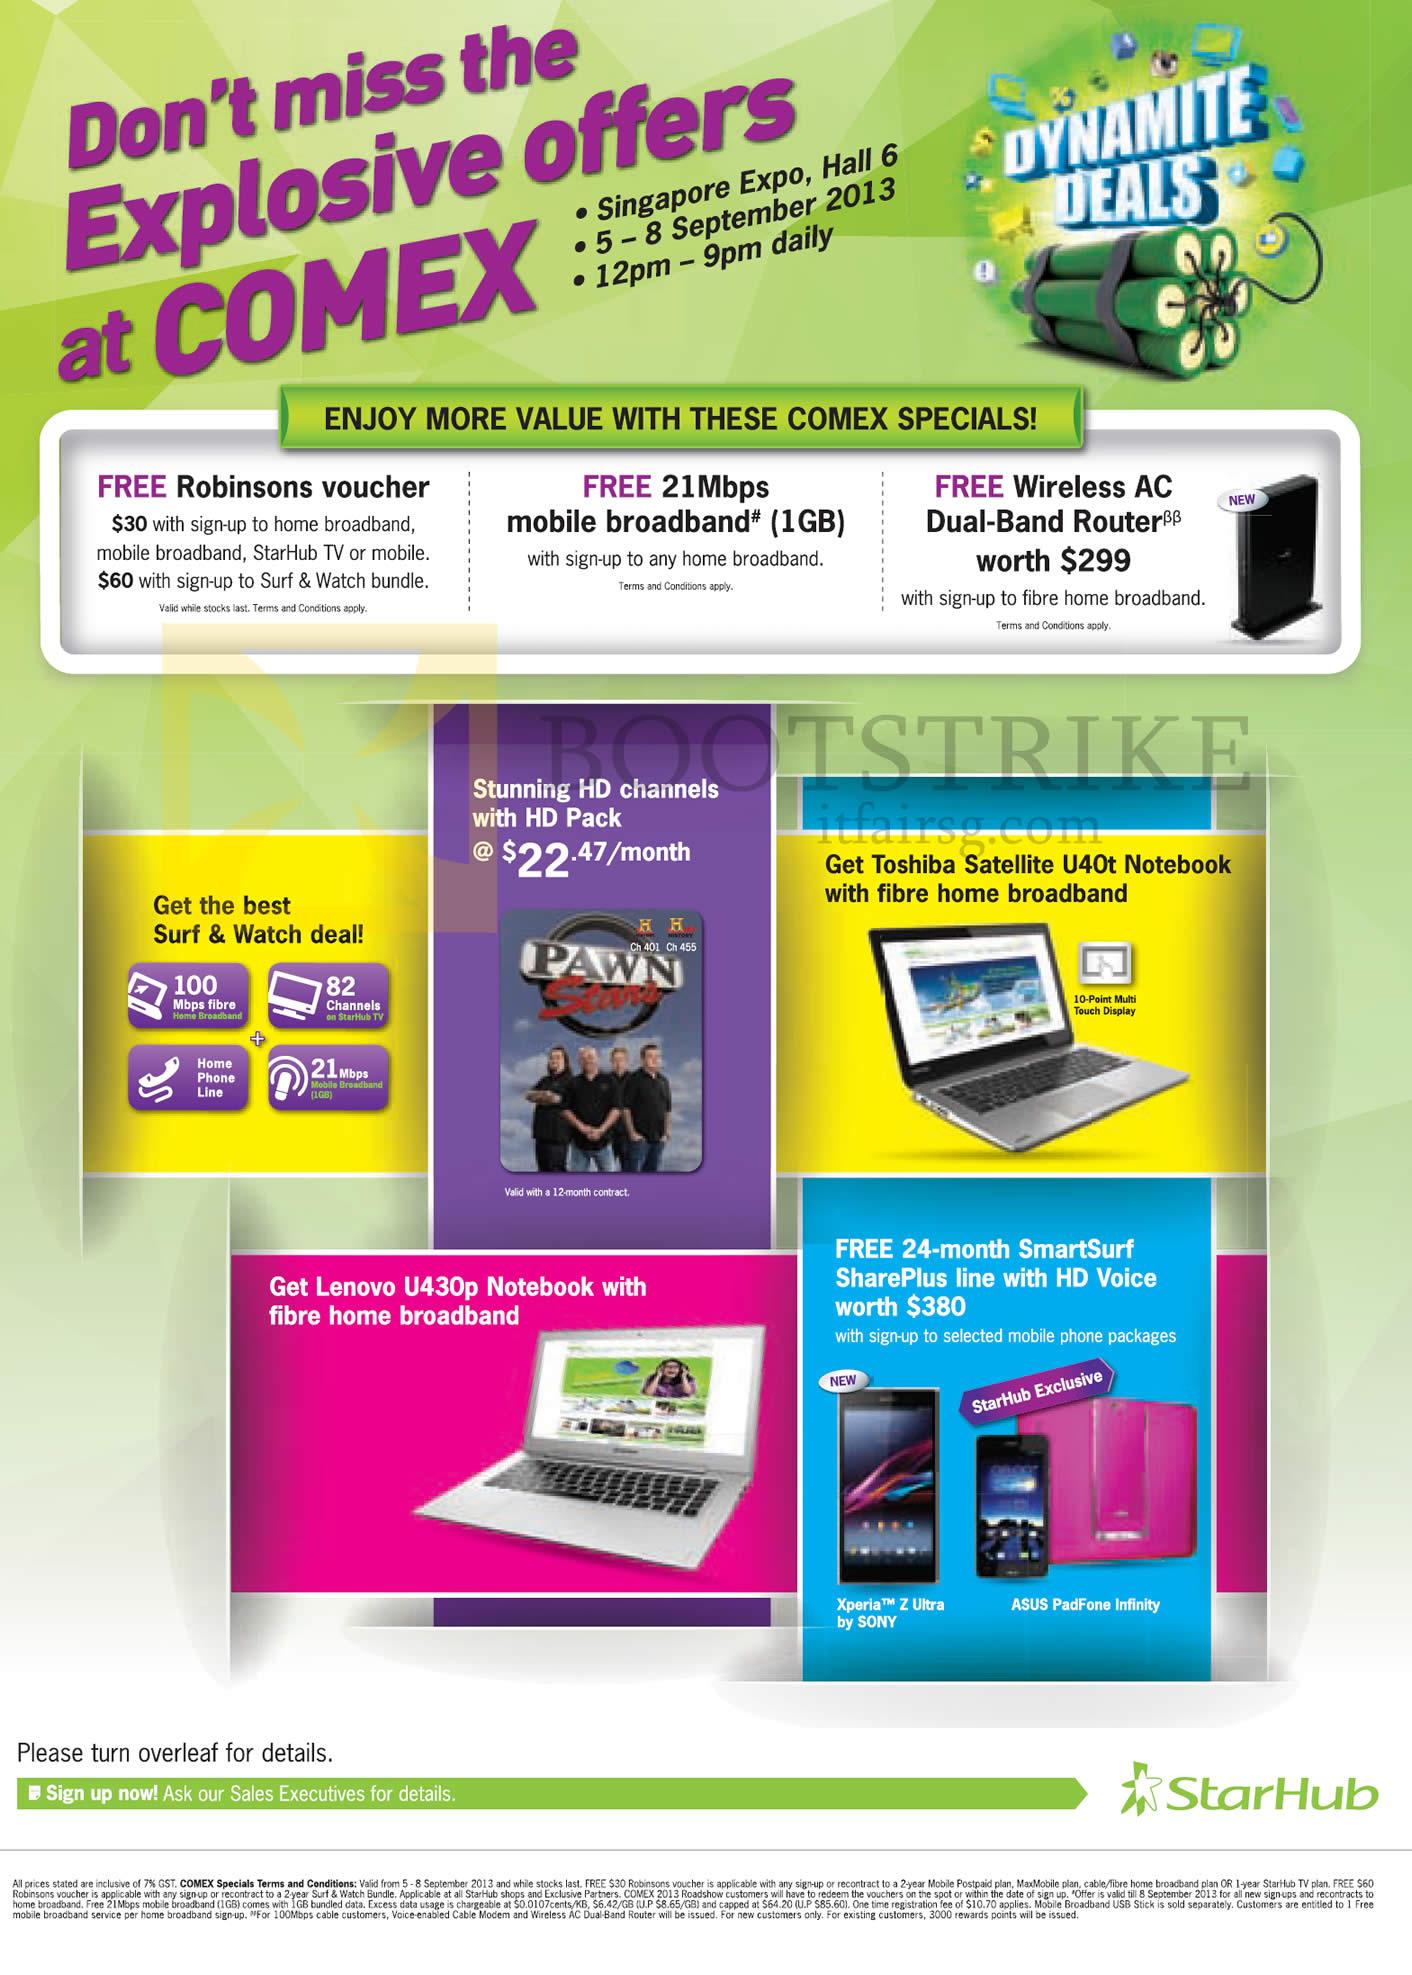 COMEX 2013 price list image brochure of Starhub Roadshow Specials, Free Robinsons Vouchers, Free 21Mbps Mobile Broadband, Free Wireless AC Router, Toshiba Satellite U40t, Lenovo U430p Notebook